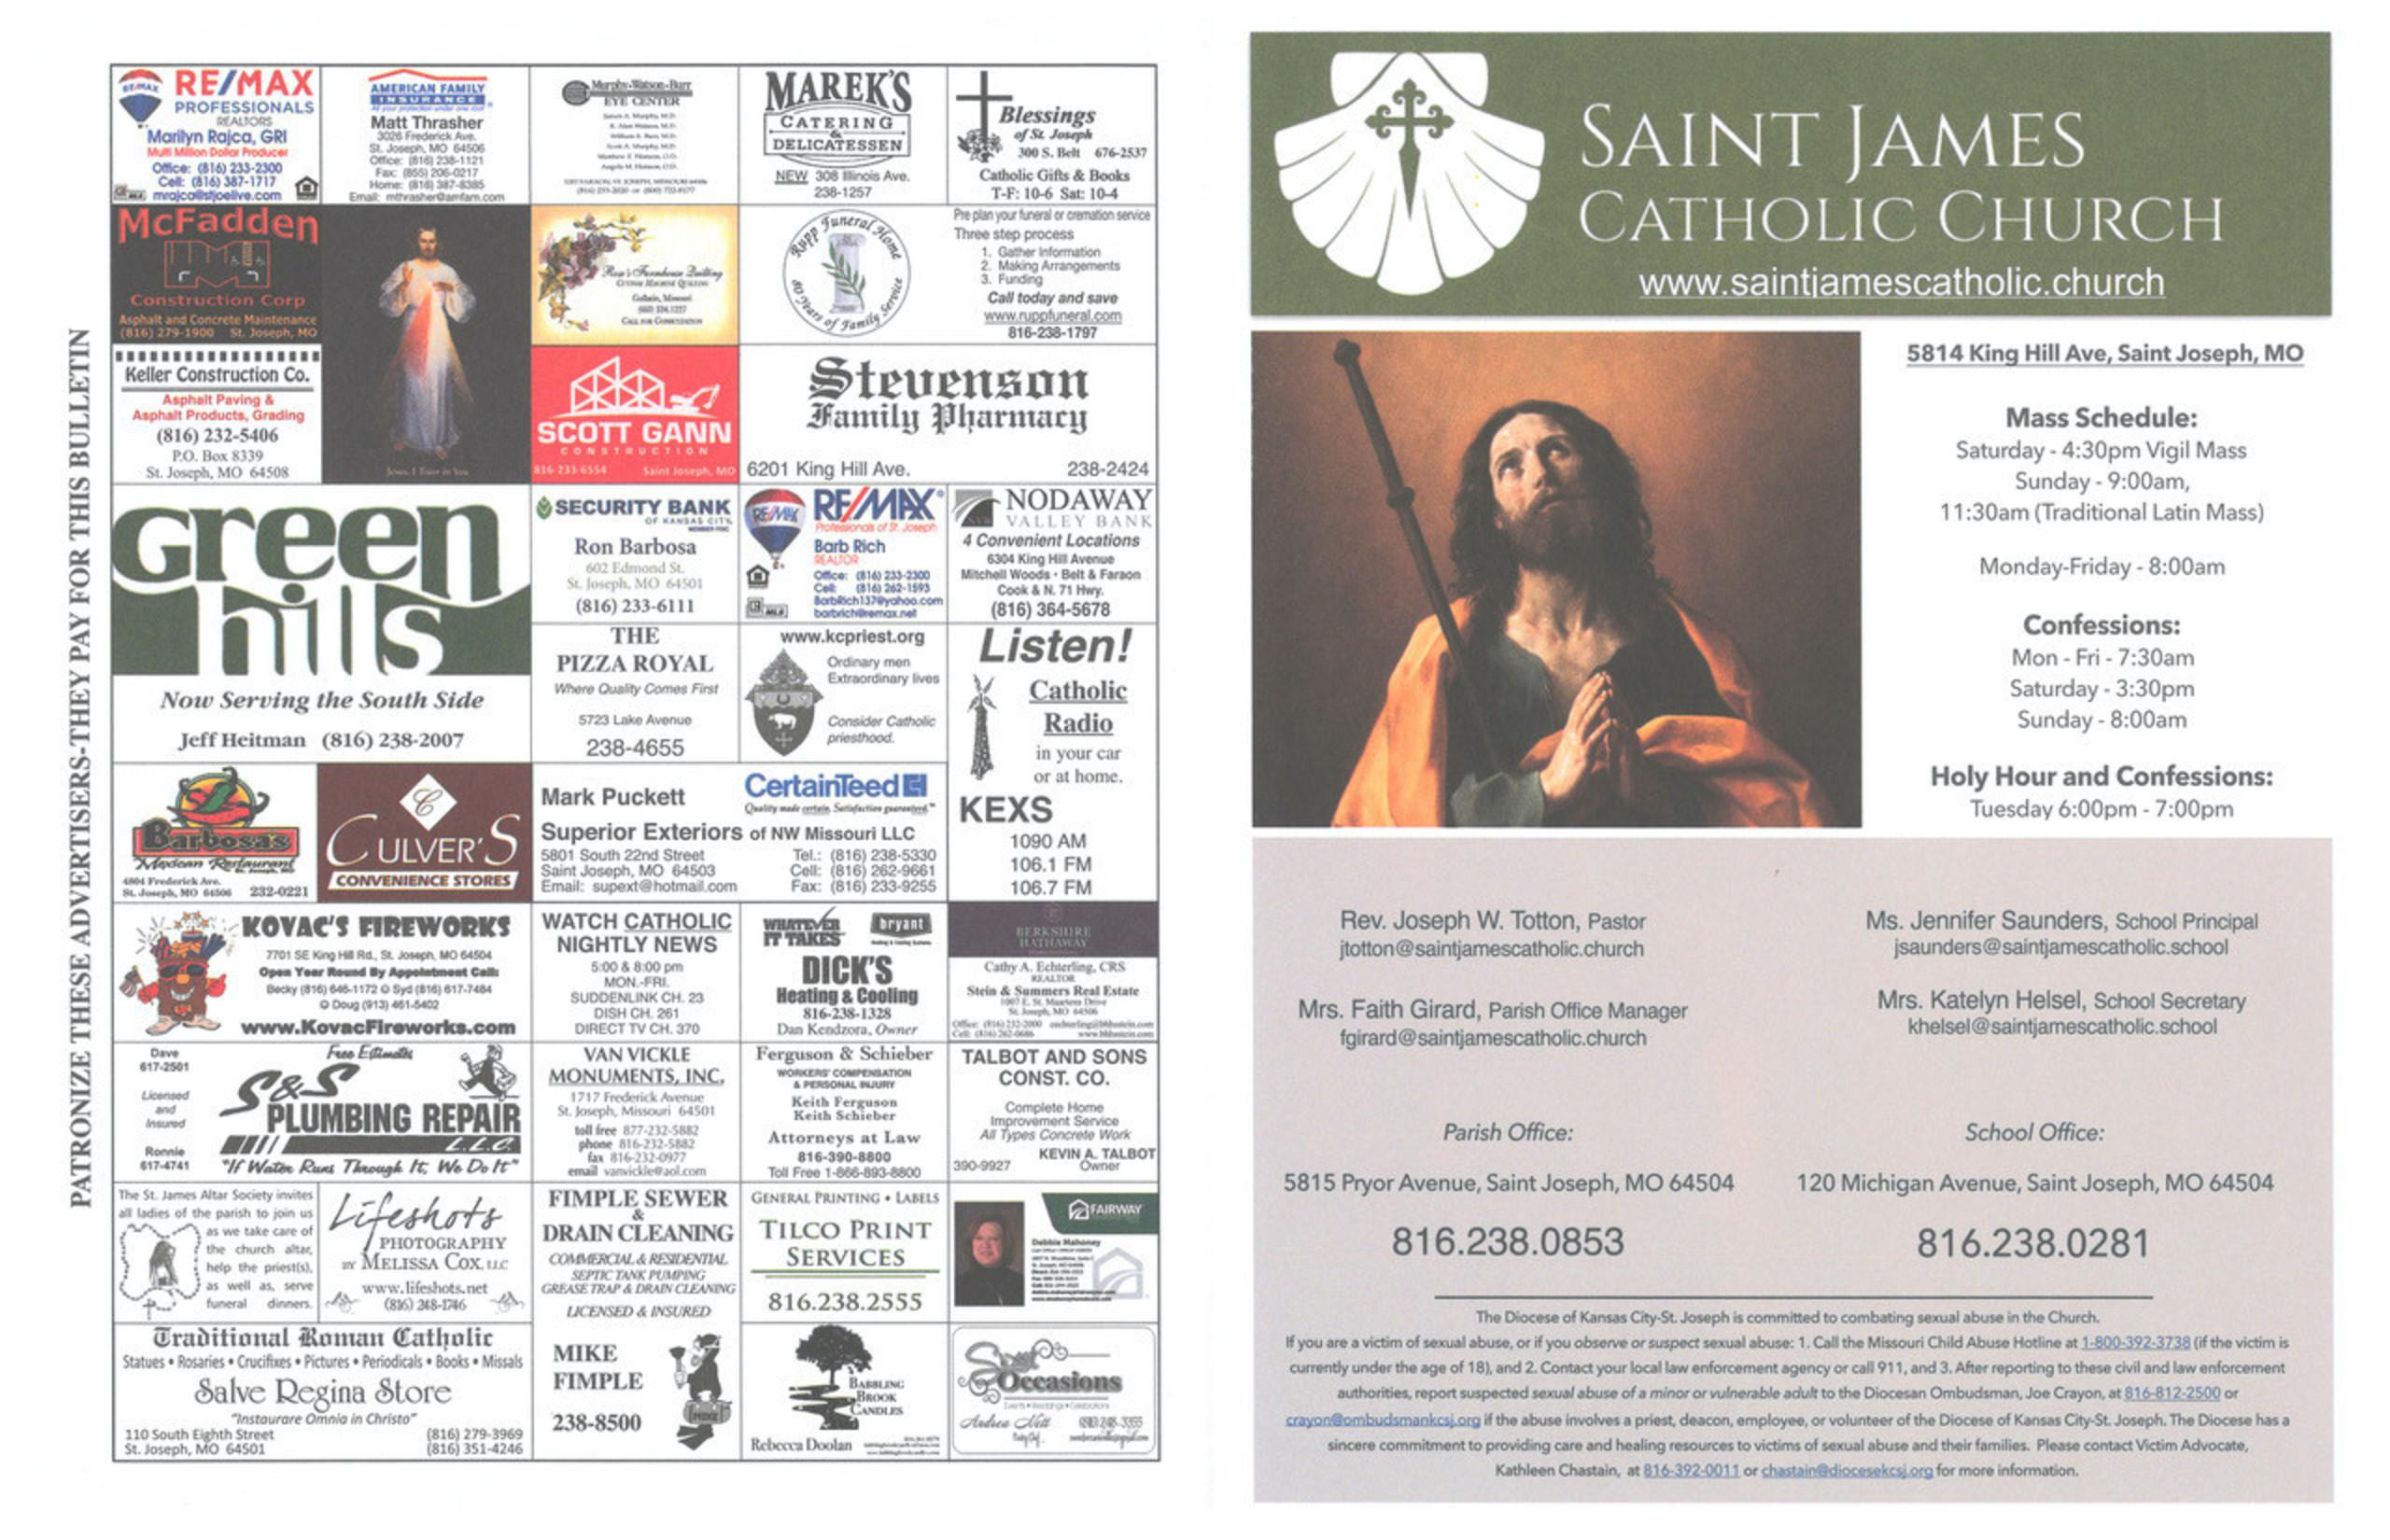 Bulletin Cover Jpg2